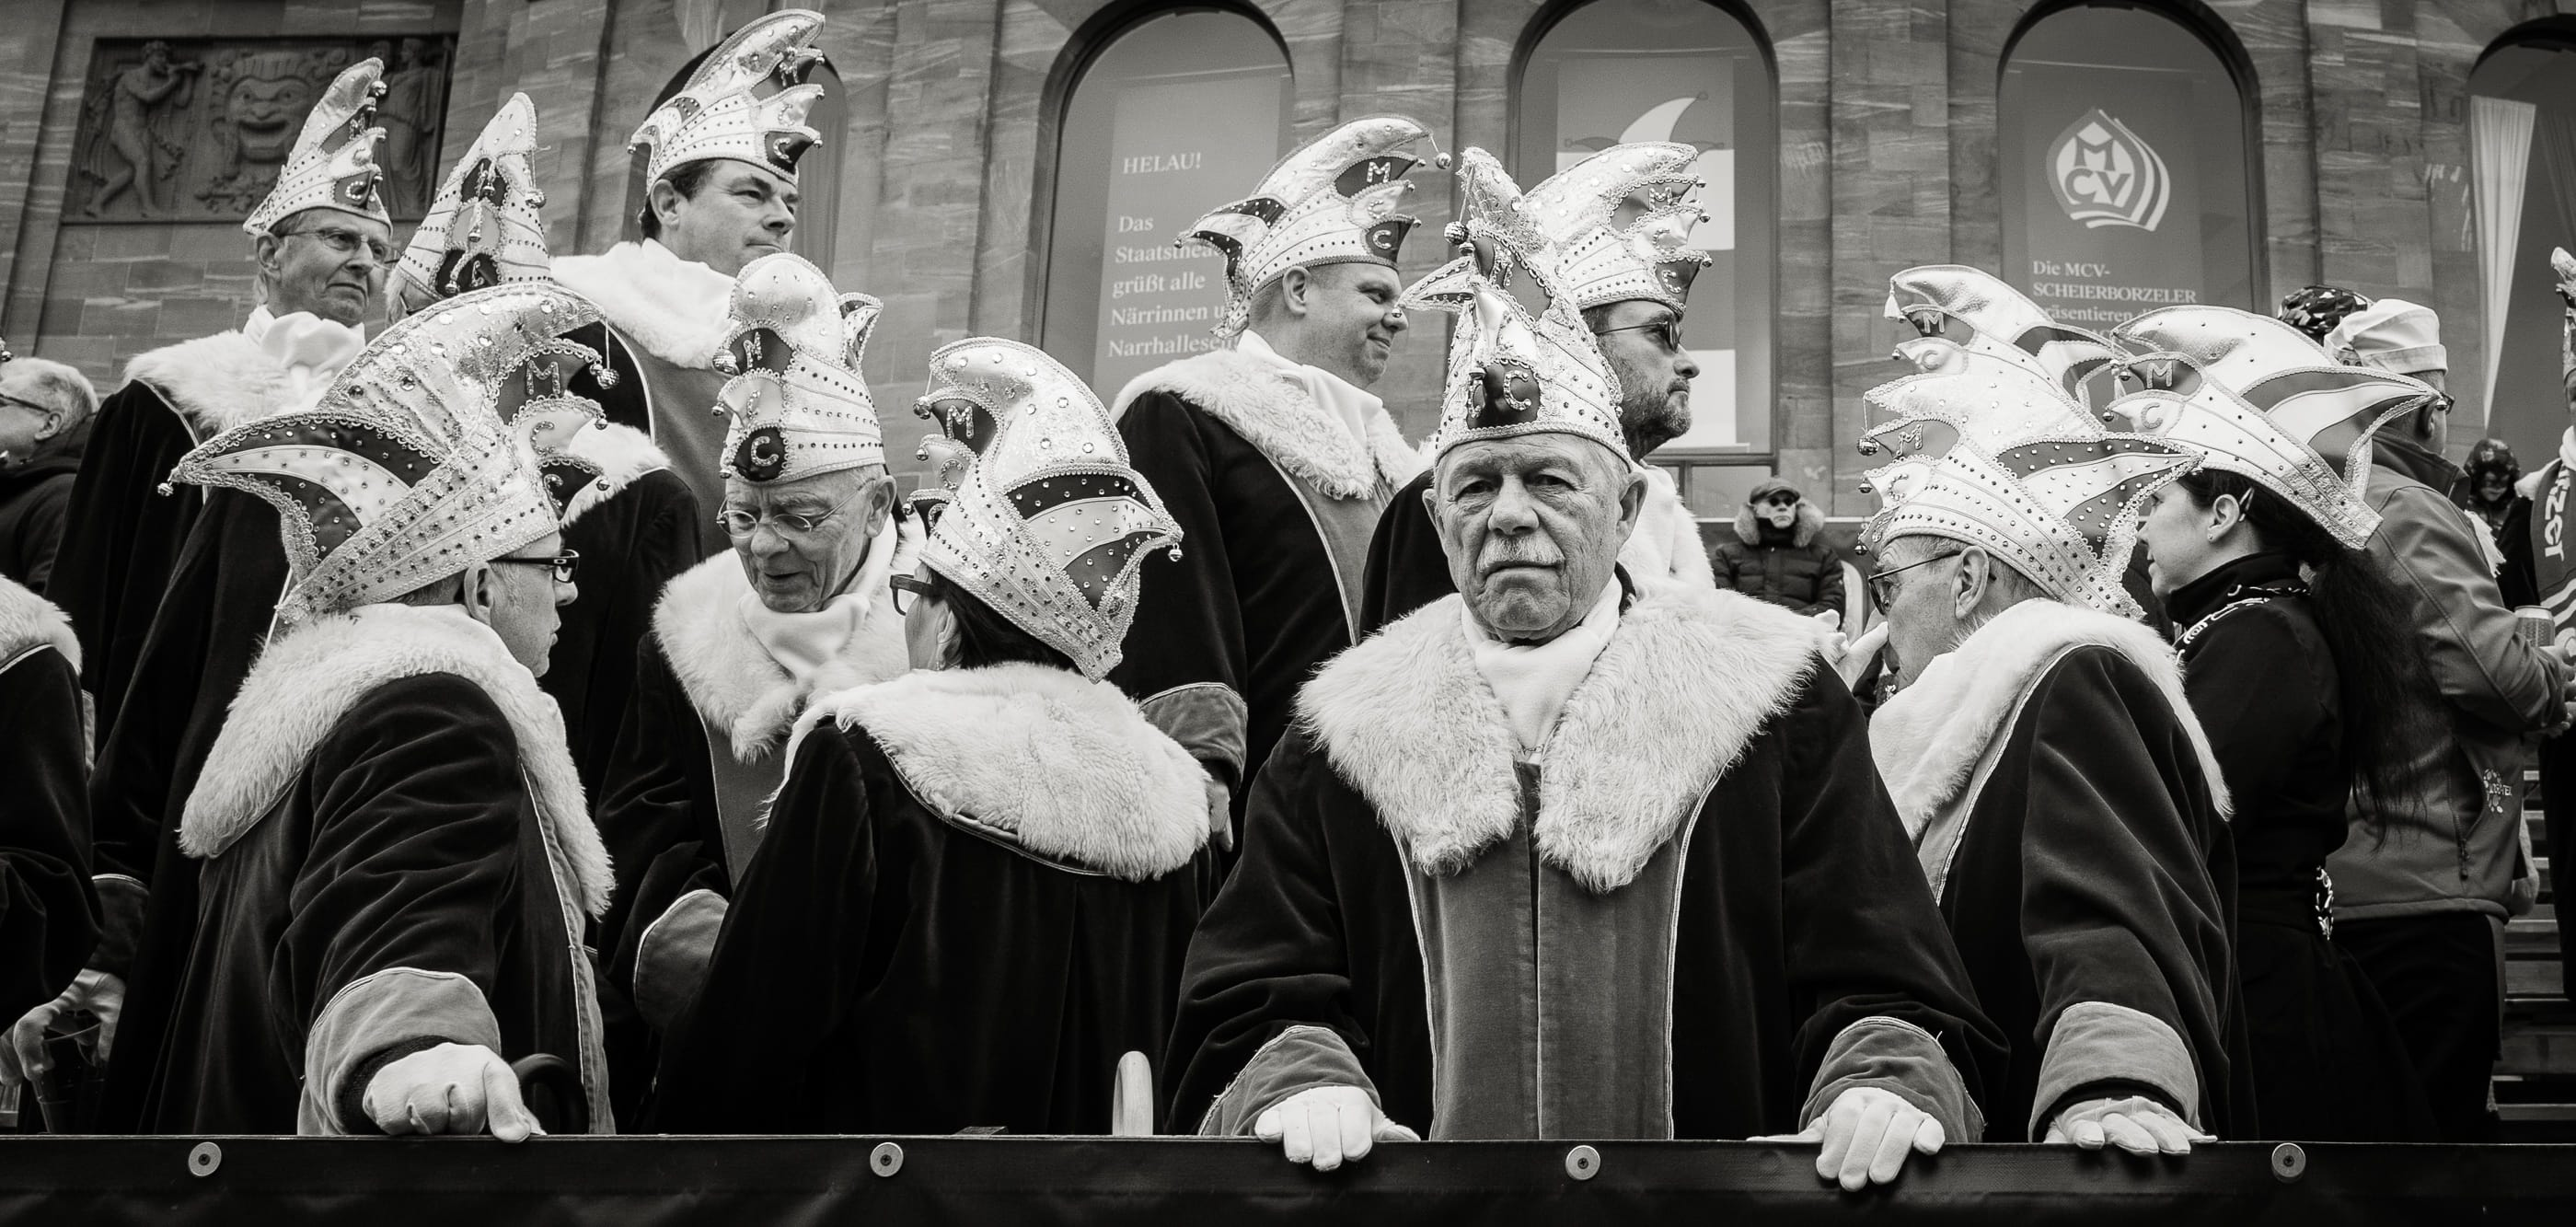 querformat-fotografie - Achim Katzberg - #helau